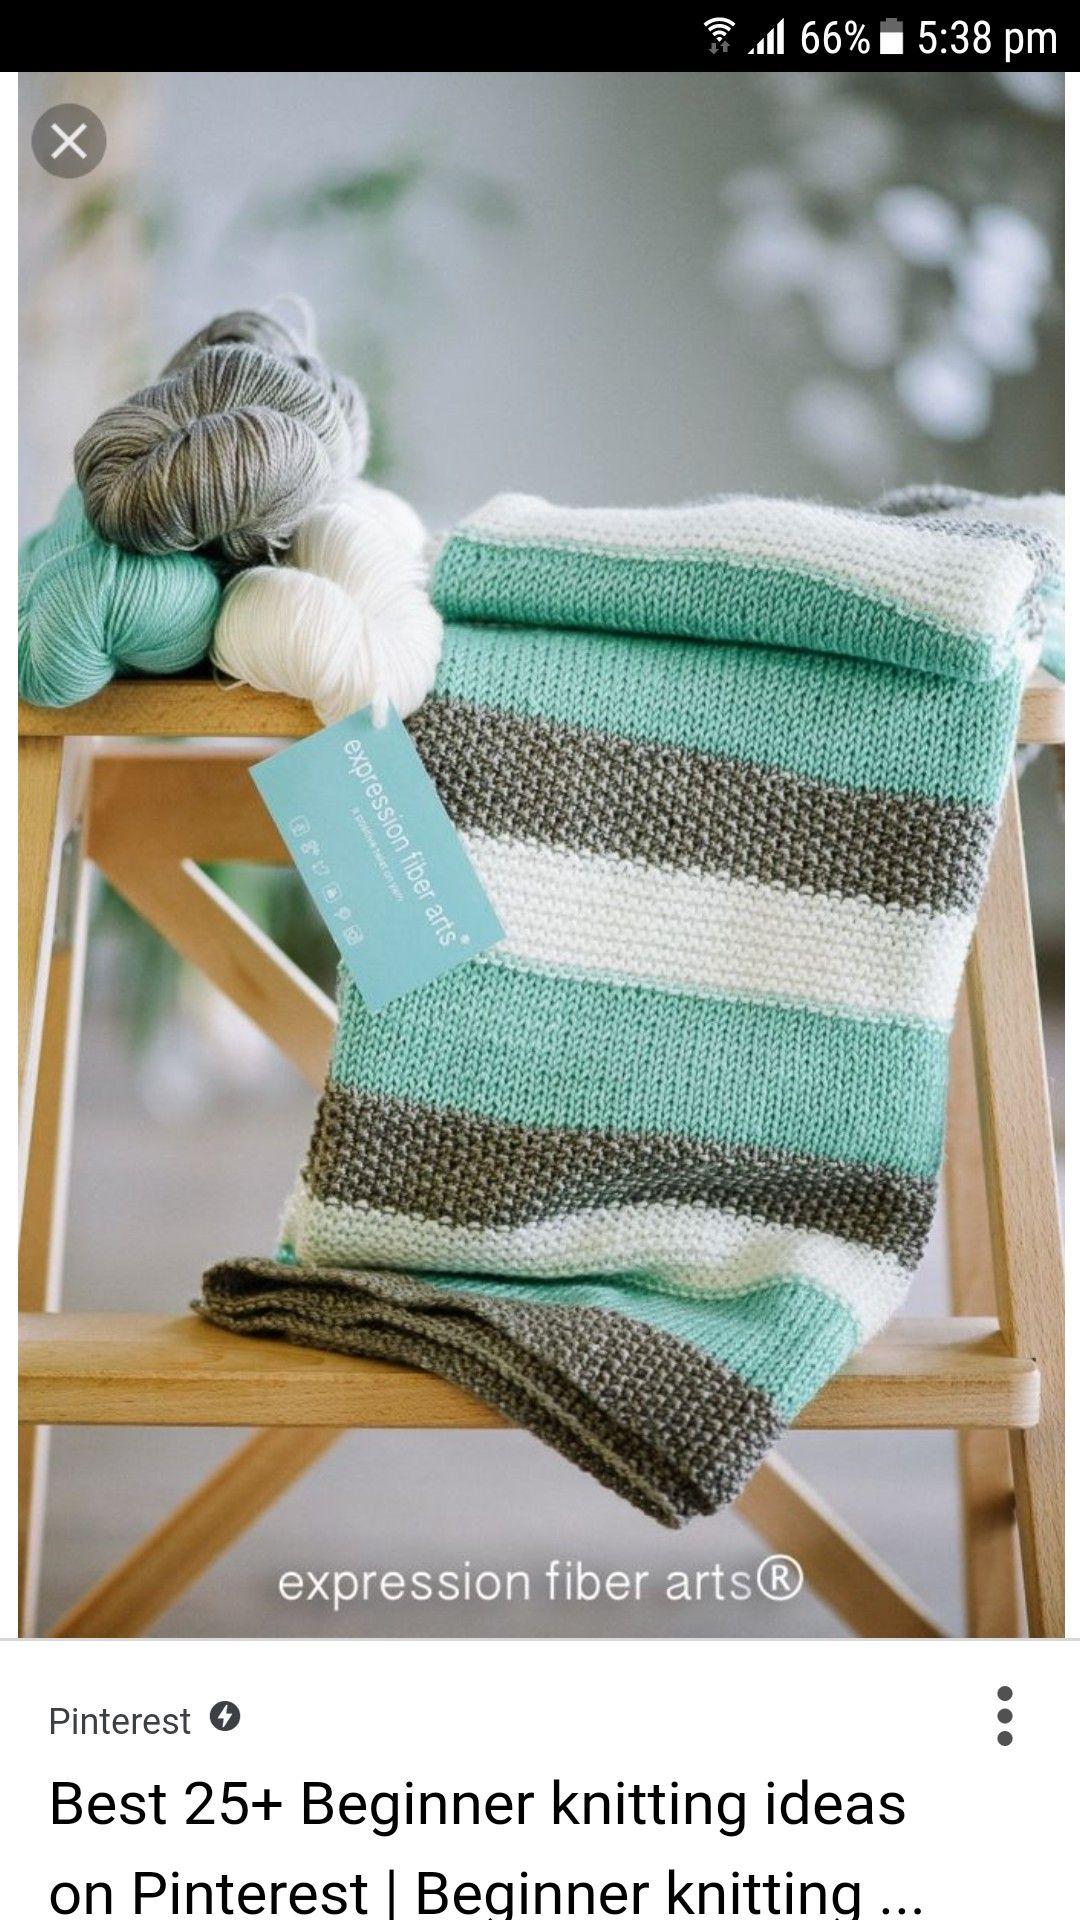 Manta de punto | Knitting | Pinterest | Crochet, Blanket and Knit ...